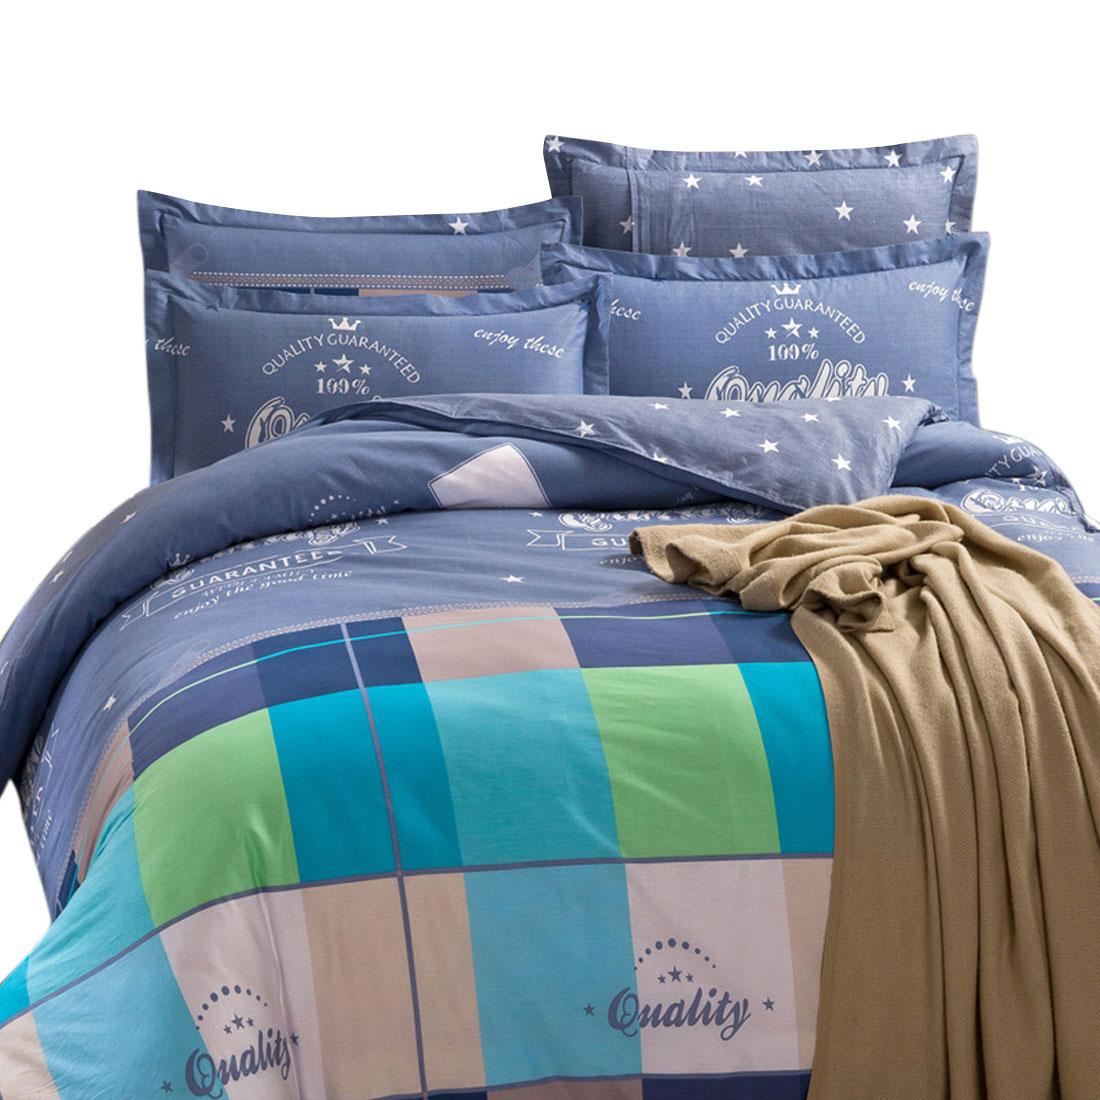 Bedroom Grid Pattern Duvet Quilt Cover Pillowcase Bedding Set Queen Size